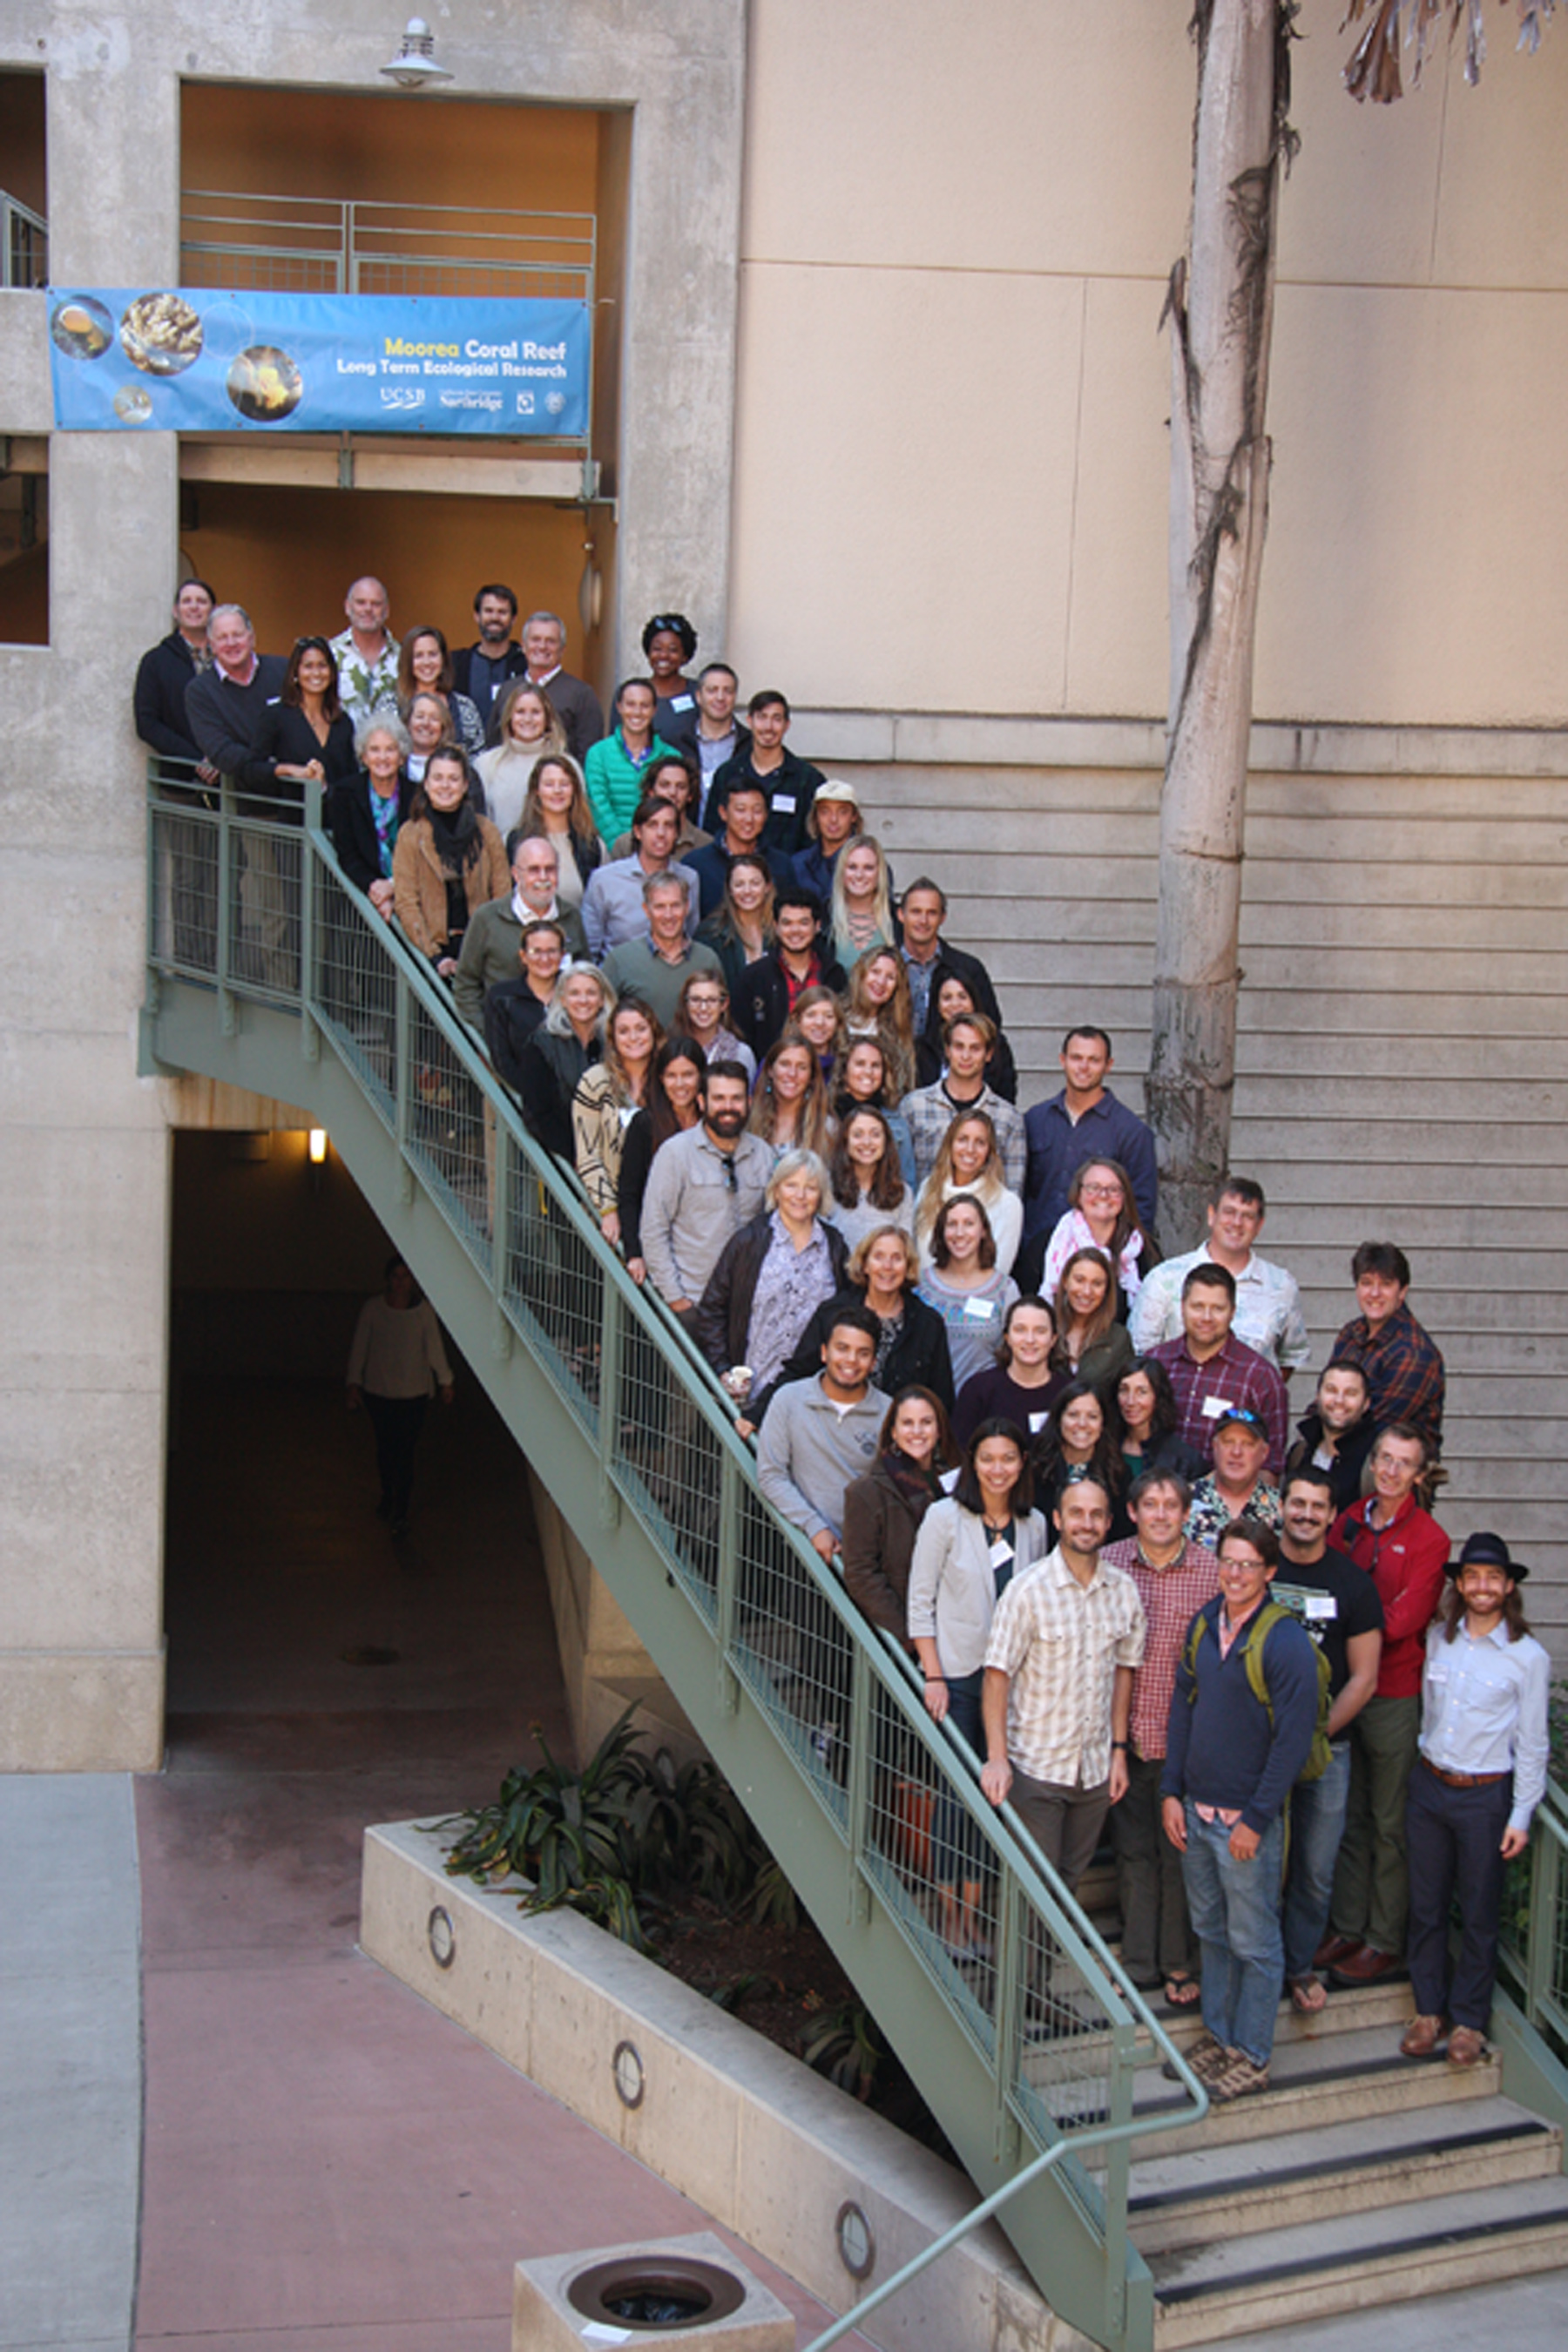 2018 MCR All Investigators Meeting photo